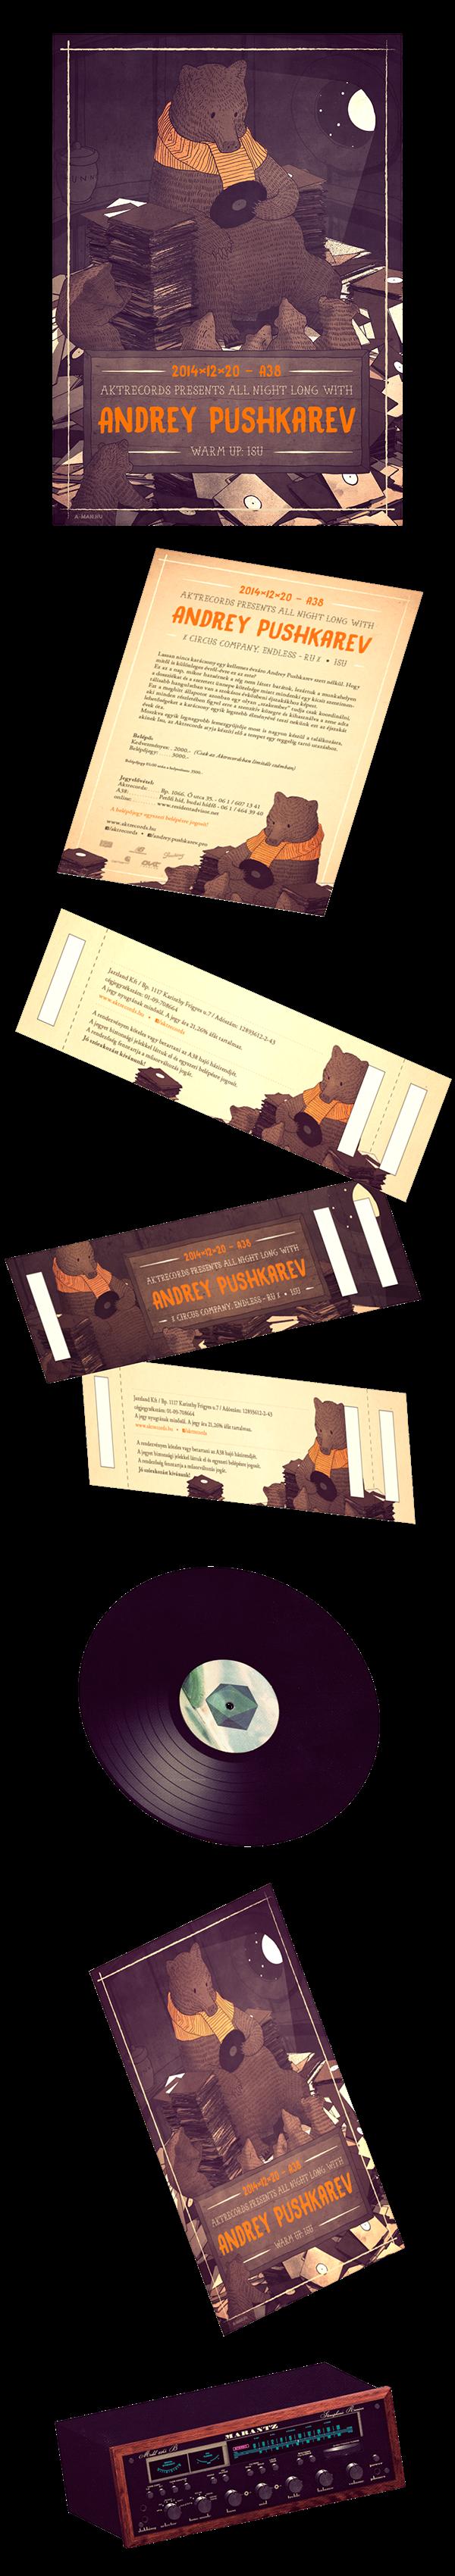 bear vinyl Records LP dj brown natural wood honey animal 3D texture party flyer ticket